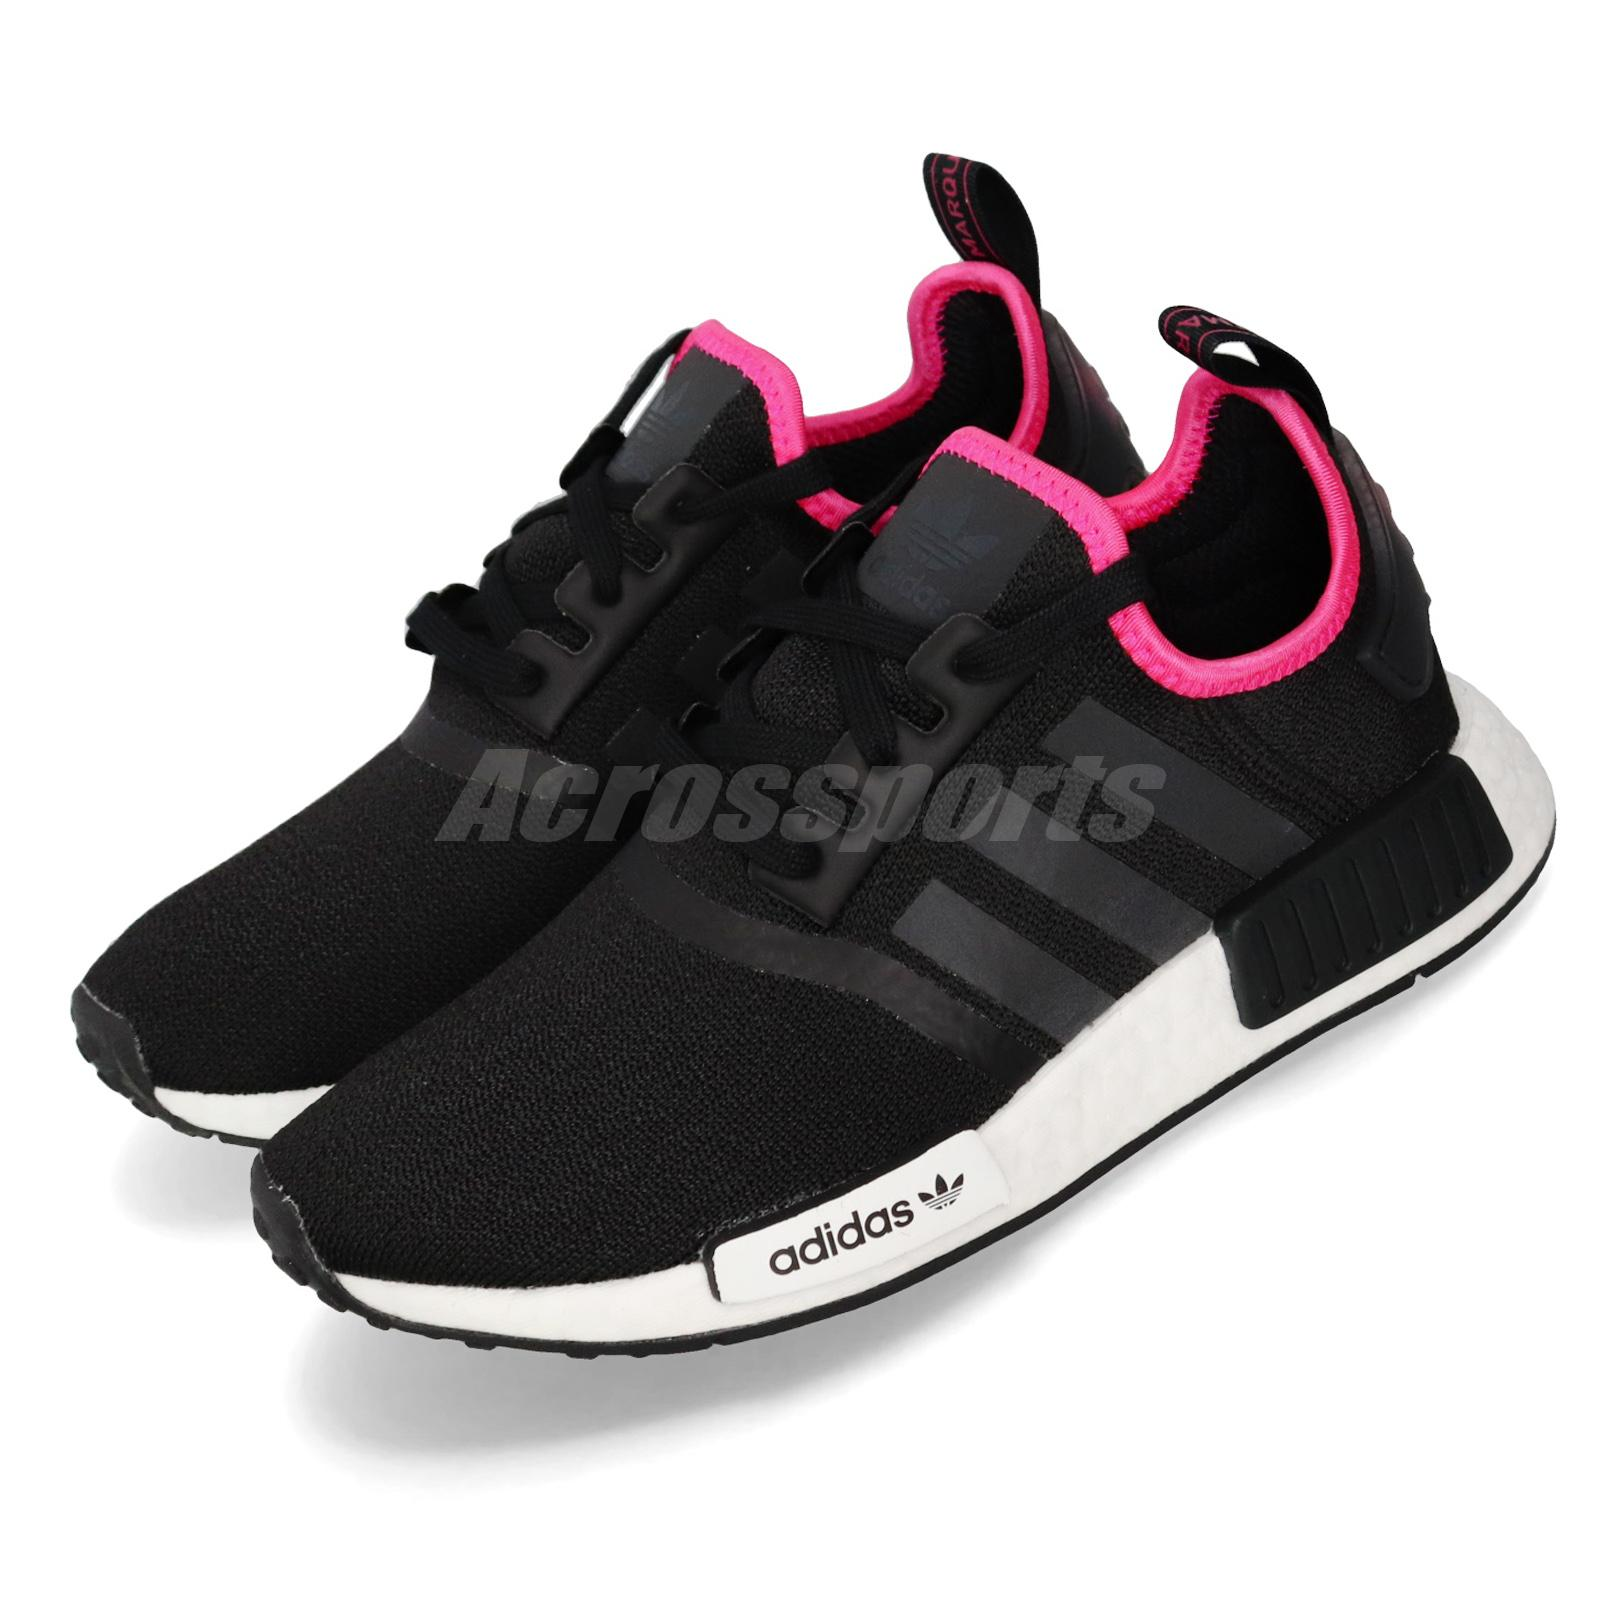 adidas Originals NMD_R1 Black Shock